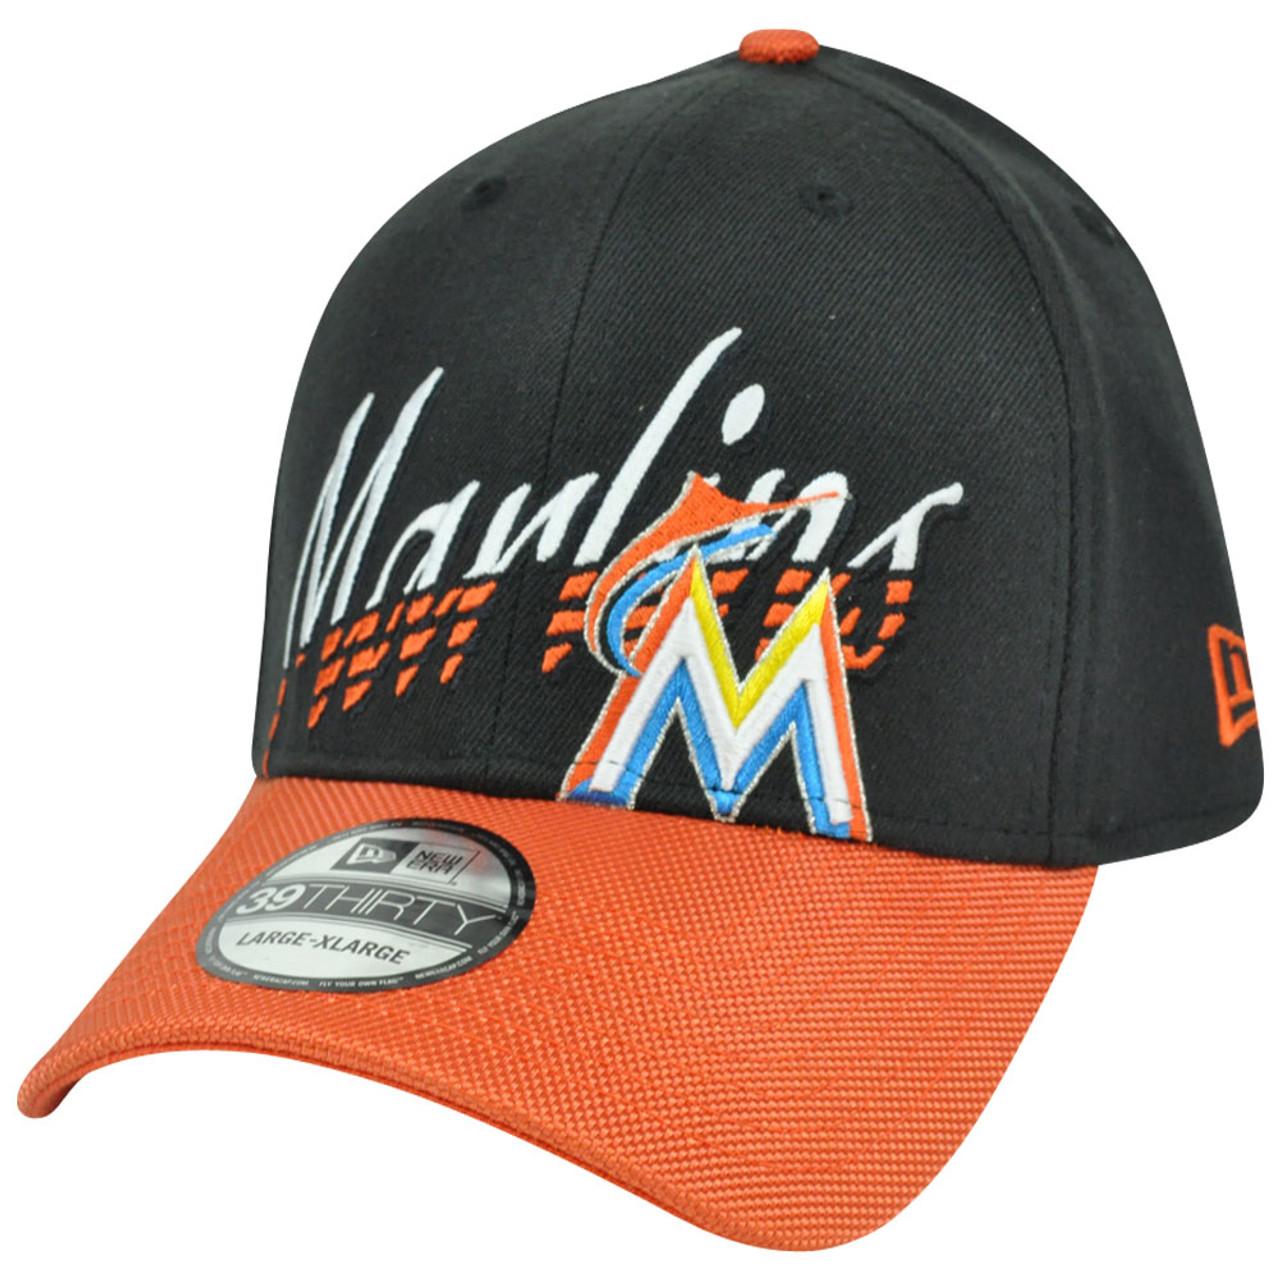 MLB Miami Marlins New Era 3930 39Thirty Double Edge Stretch Flex Fit S M Hat 4238d7a92e8e